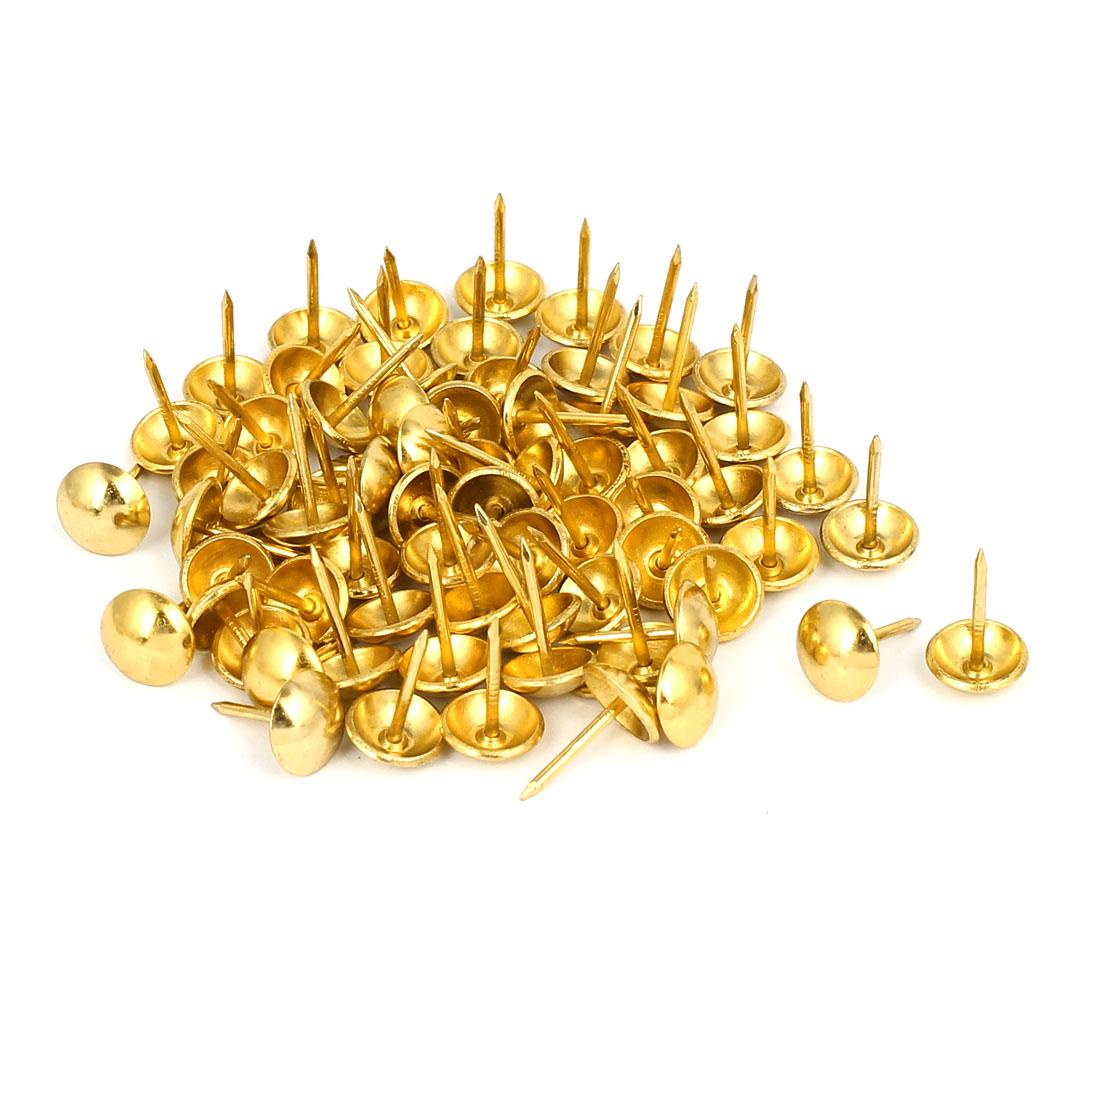 "7/16"" Head Dia 17mm Height Upholstery Tack Nail Push Pin Gold Tone 80pcs"